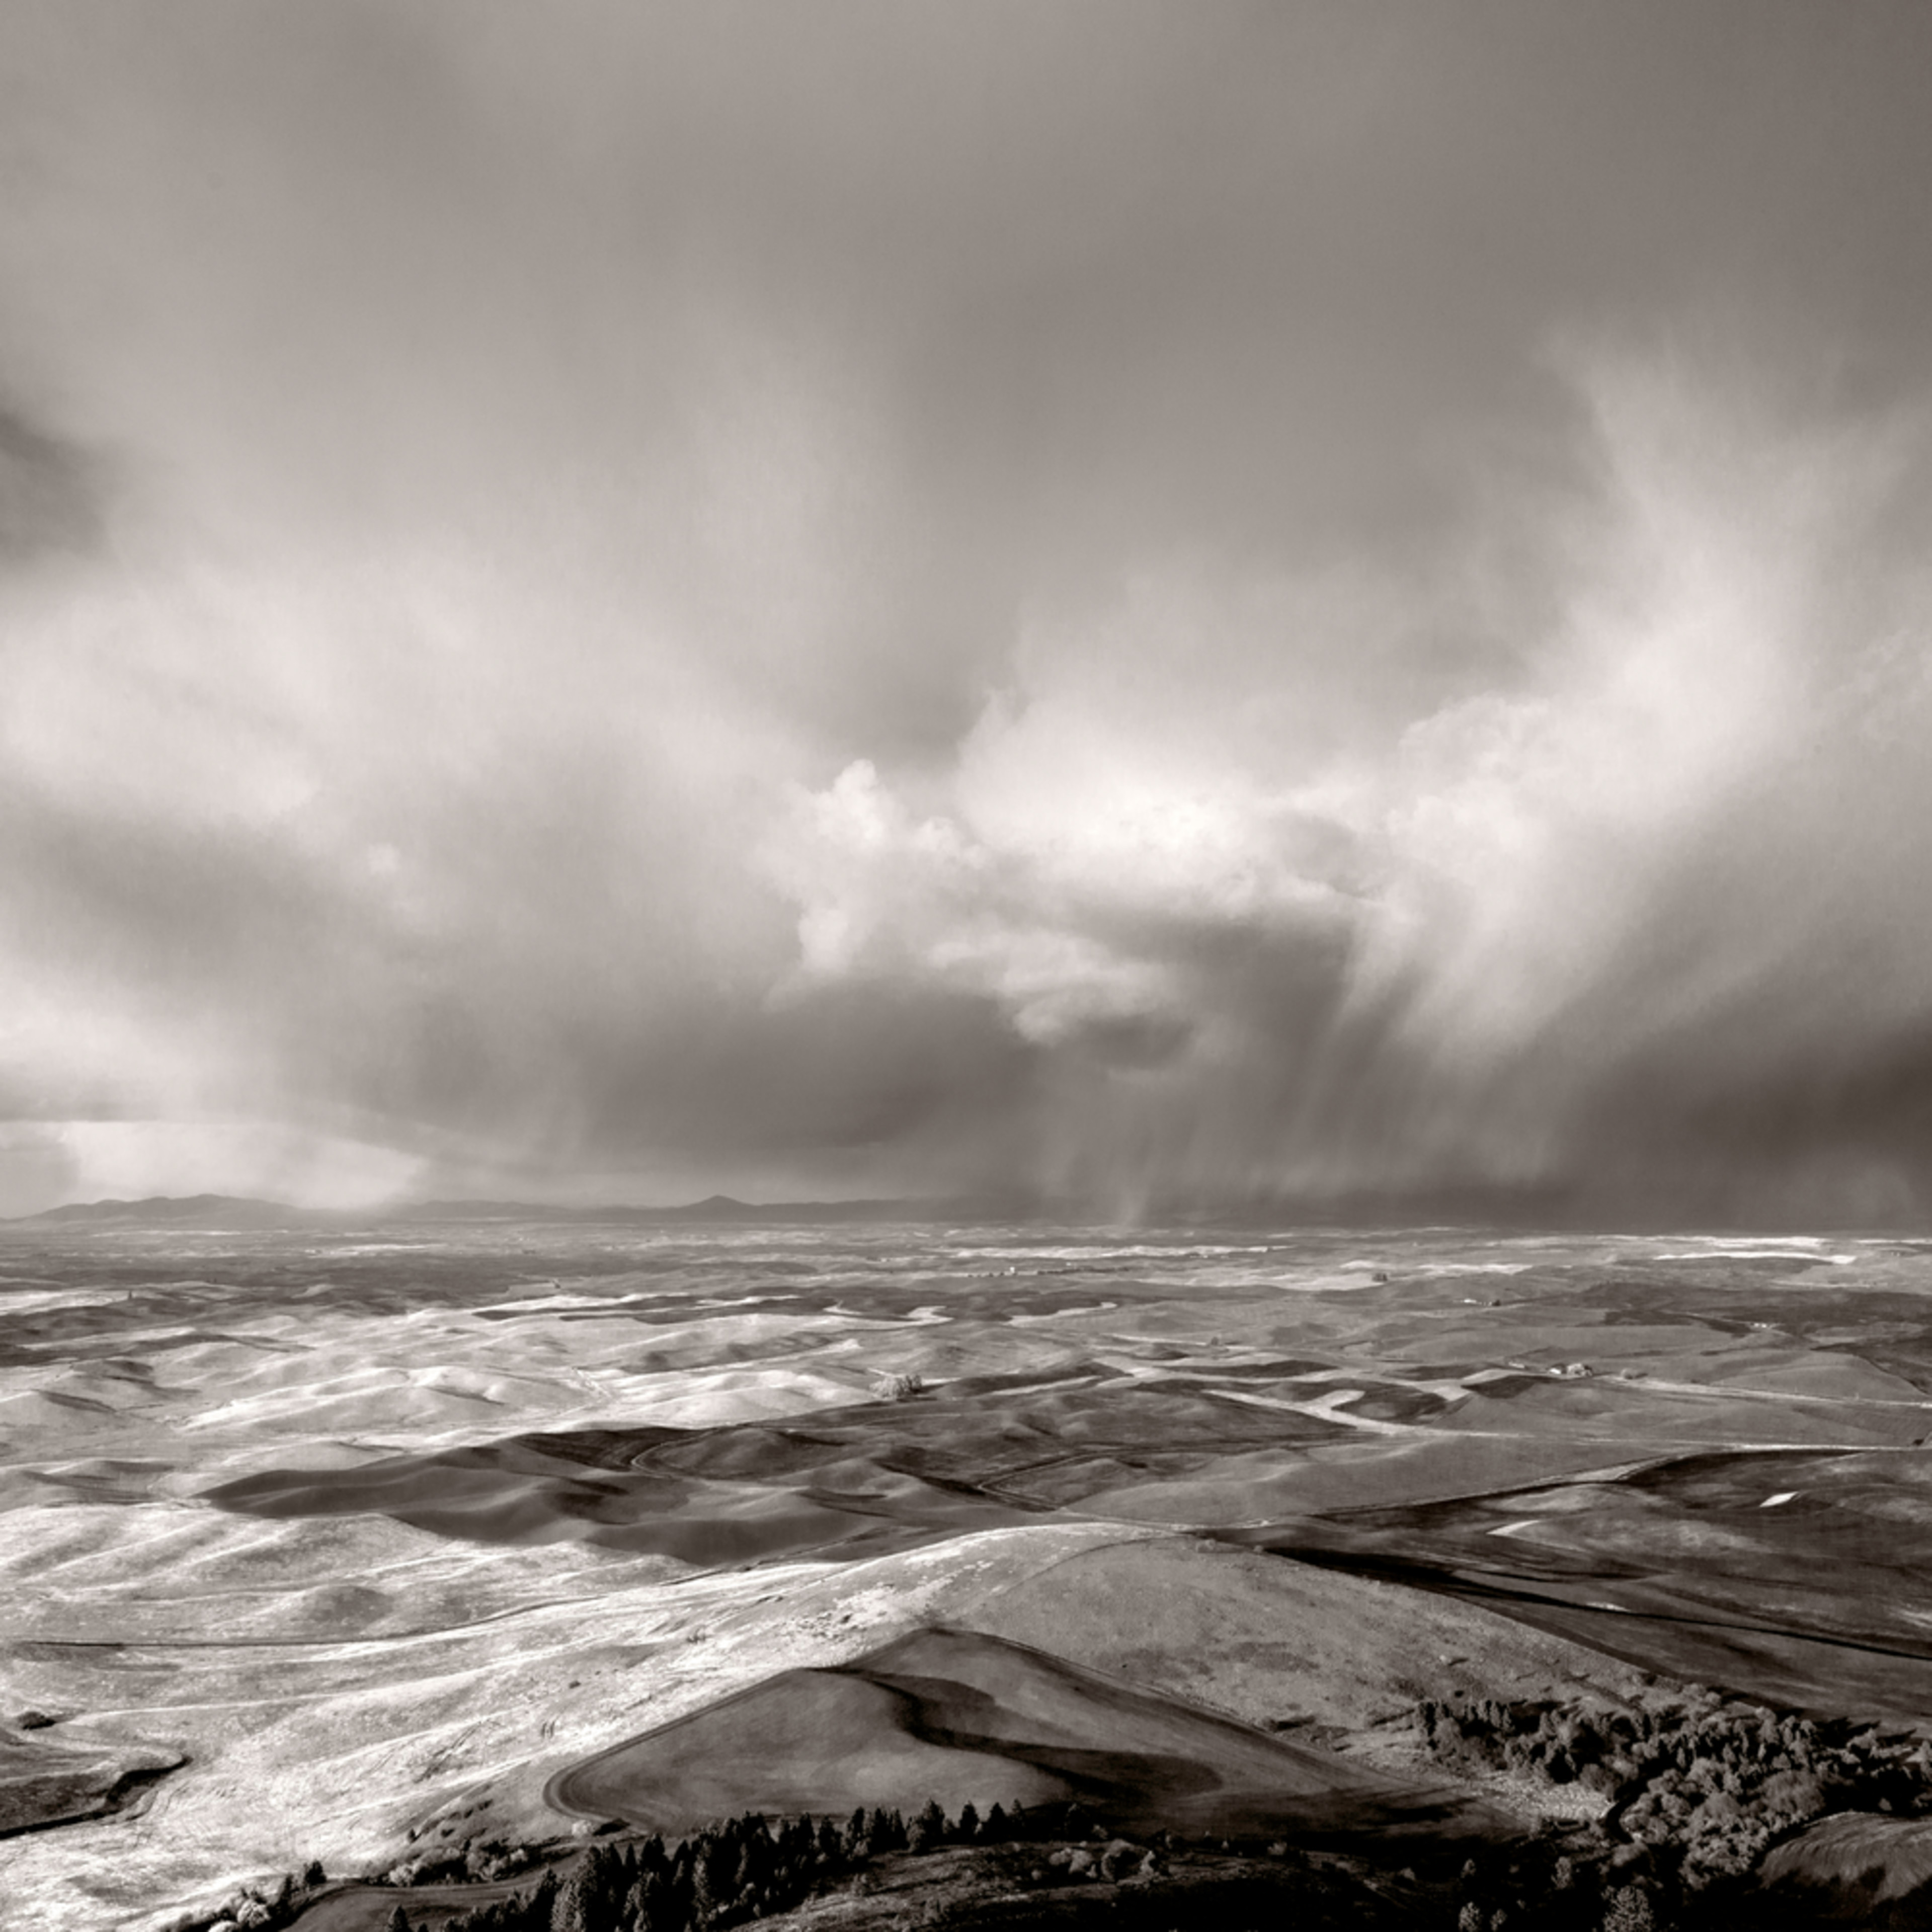 Steptoe storm palouse prairie j7823 ghpamq